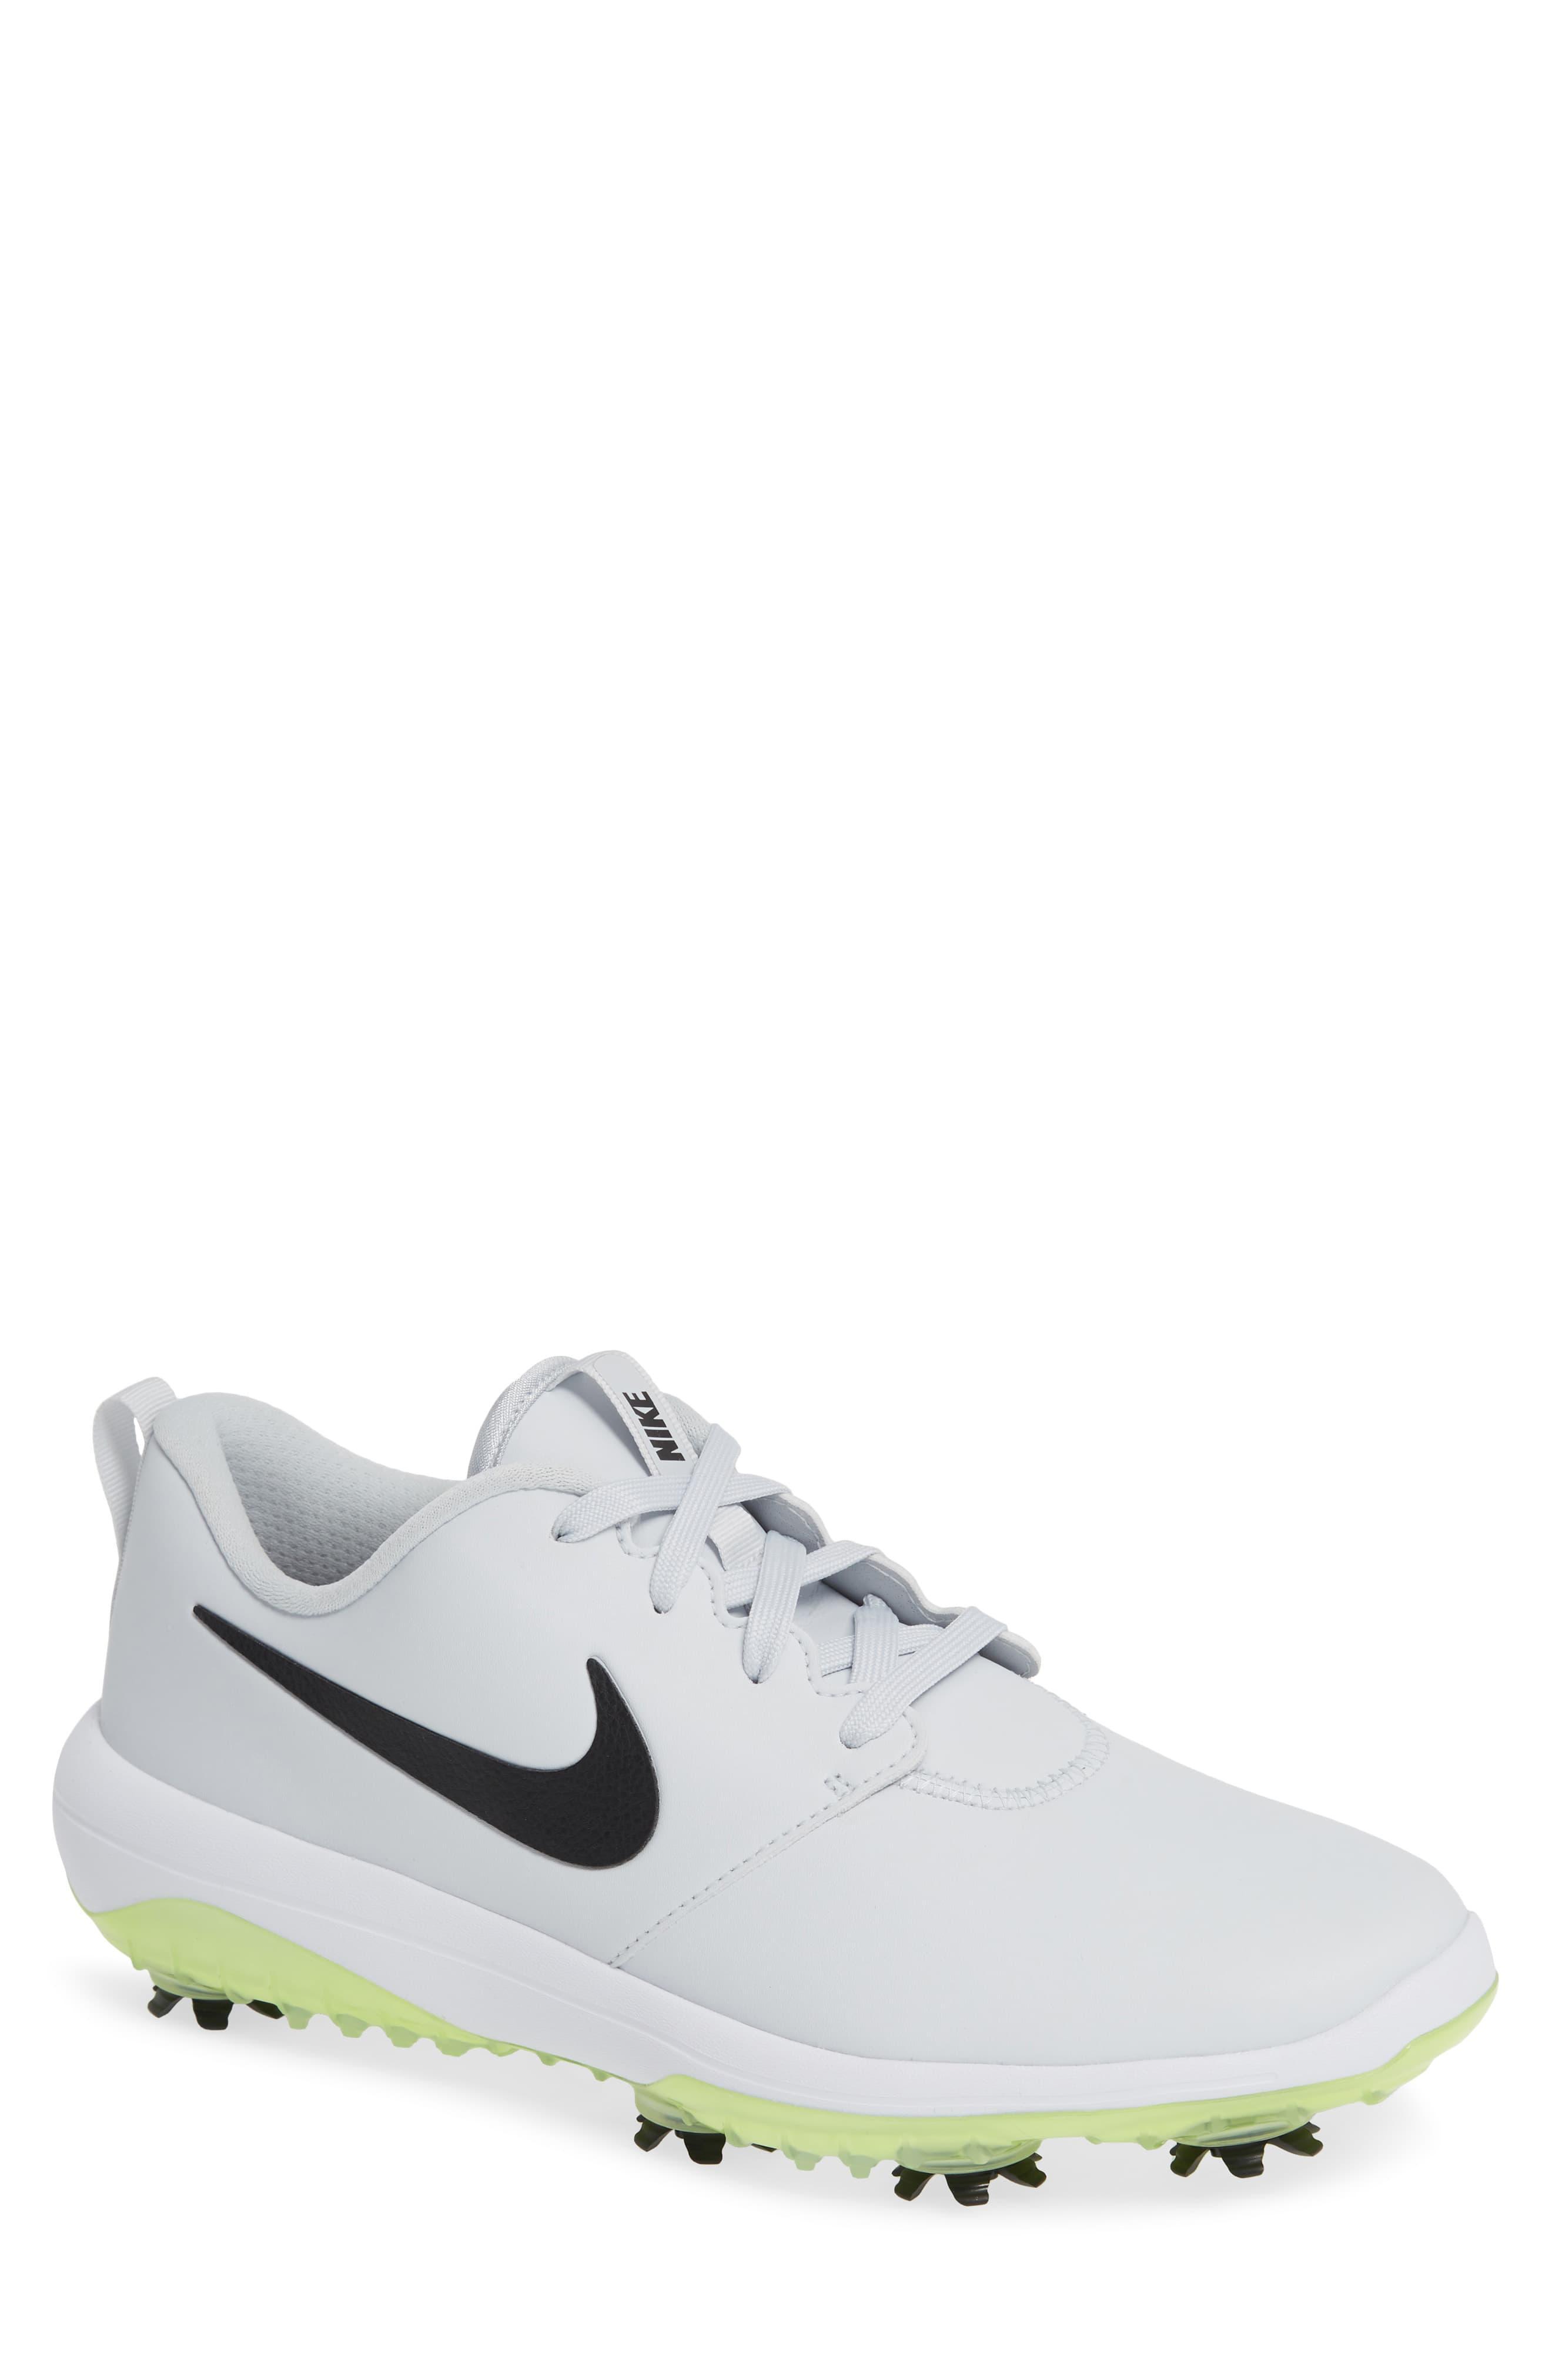 quality design 0d80f 98520 Nike. Roshe G Tour (pure Platinum black white volt Glow) Men s Golf Shoes